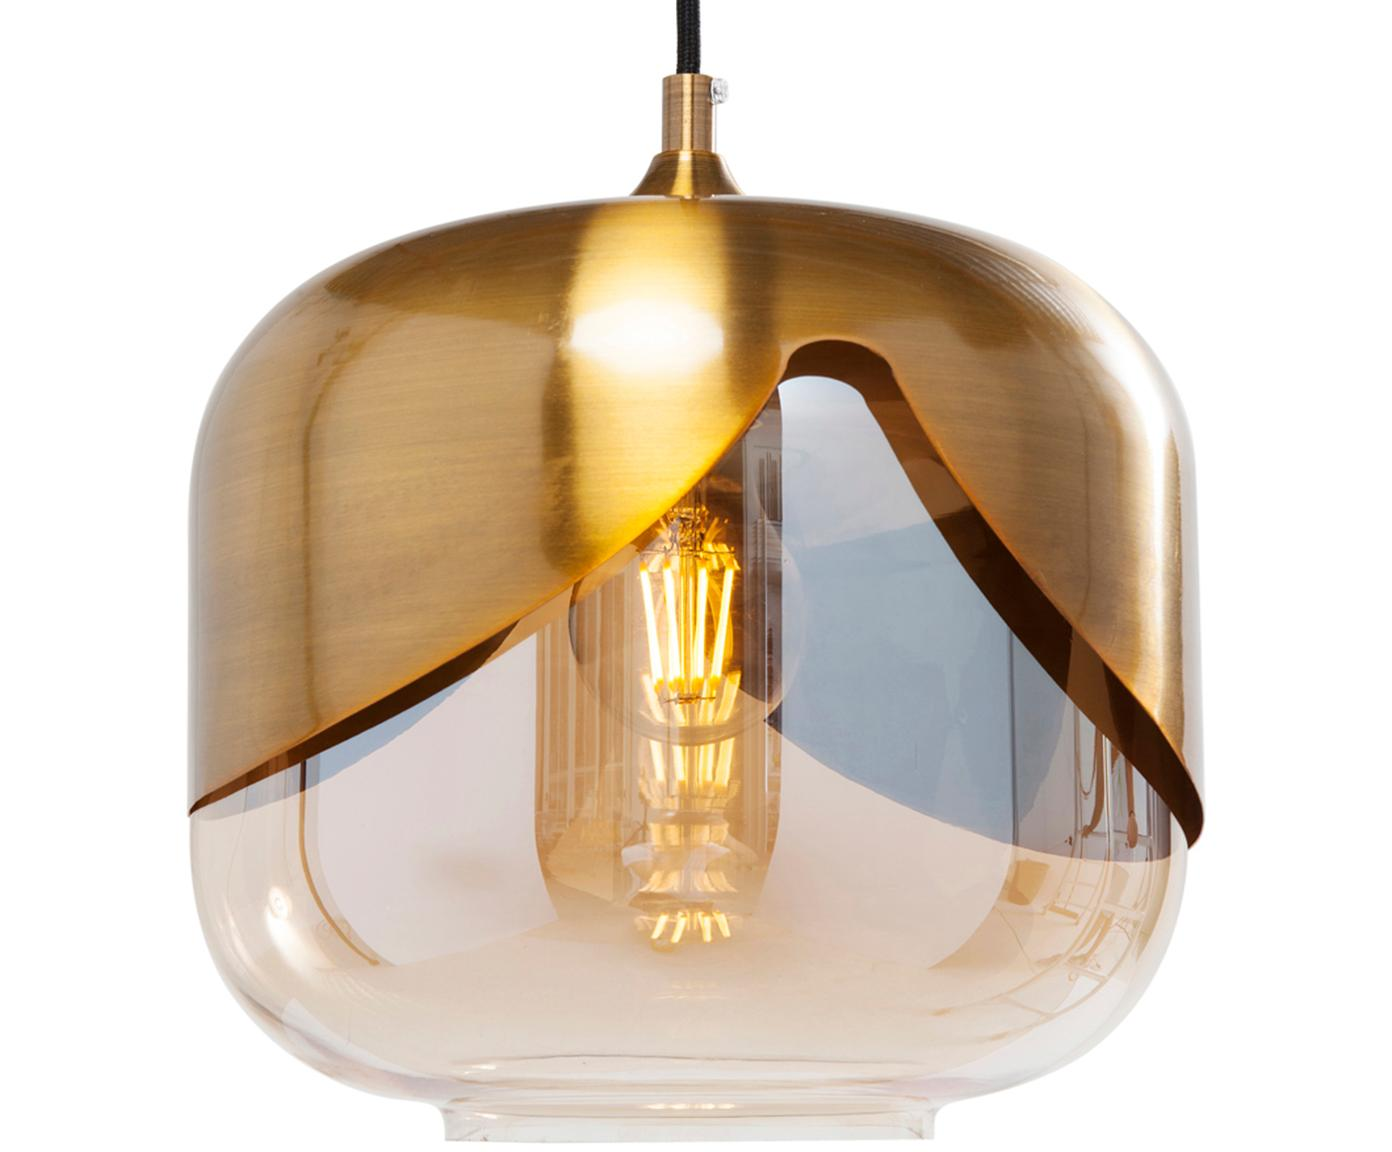 Lámpara de techo Golden Goblet, Pantalla: vidrio tintado, Cable: cubierto en plástico, Latón, Ø 25 x Al 25 cm